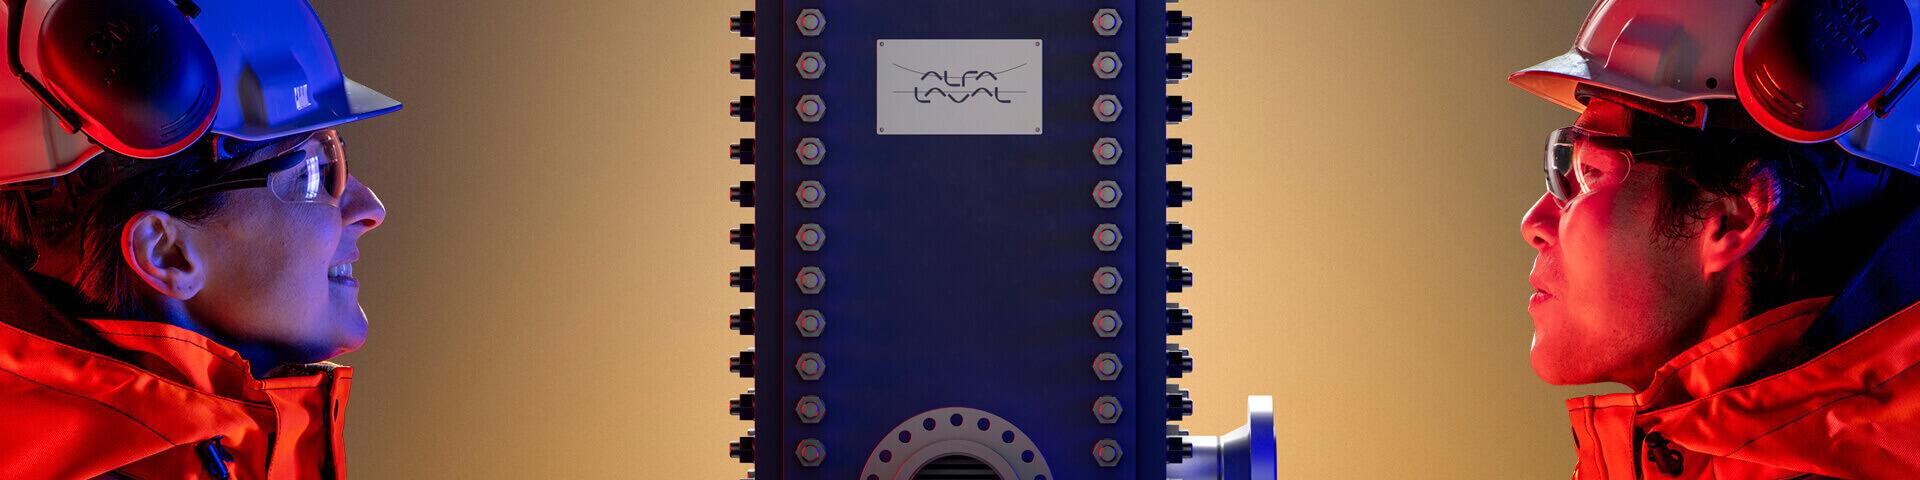 Banner_landing_page_Compabloc+_1920x480.jpg